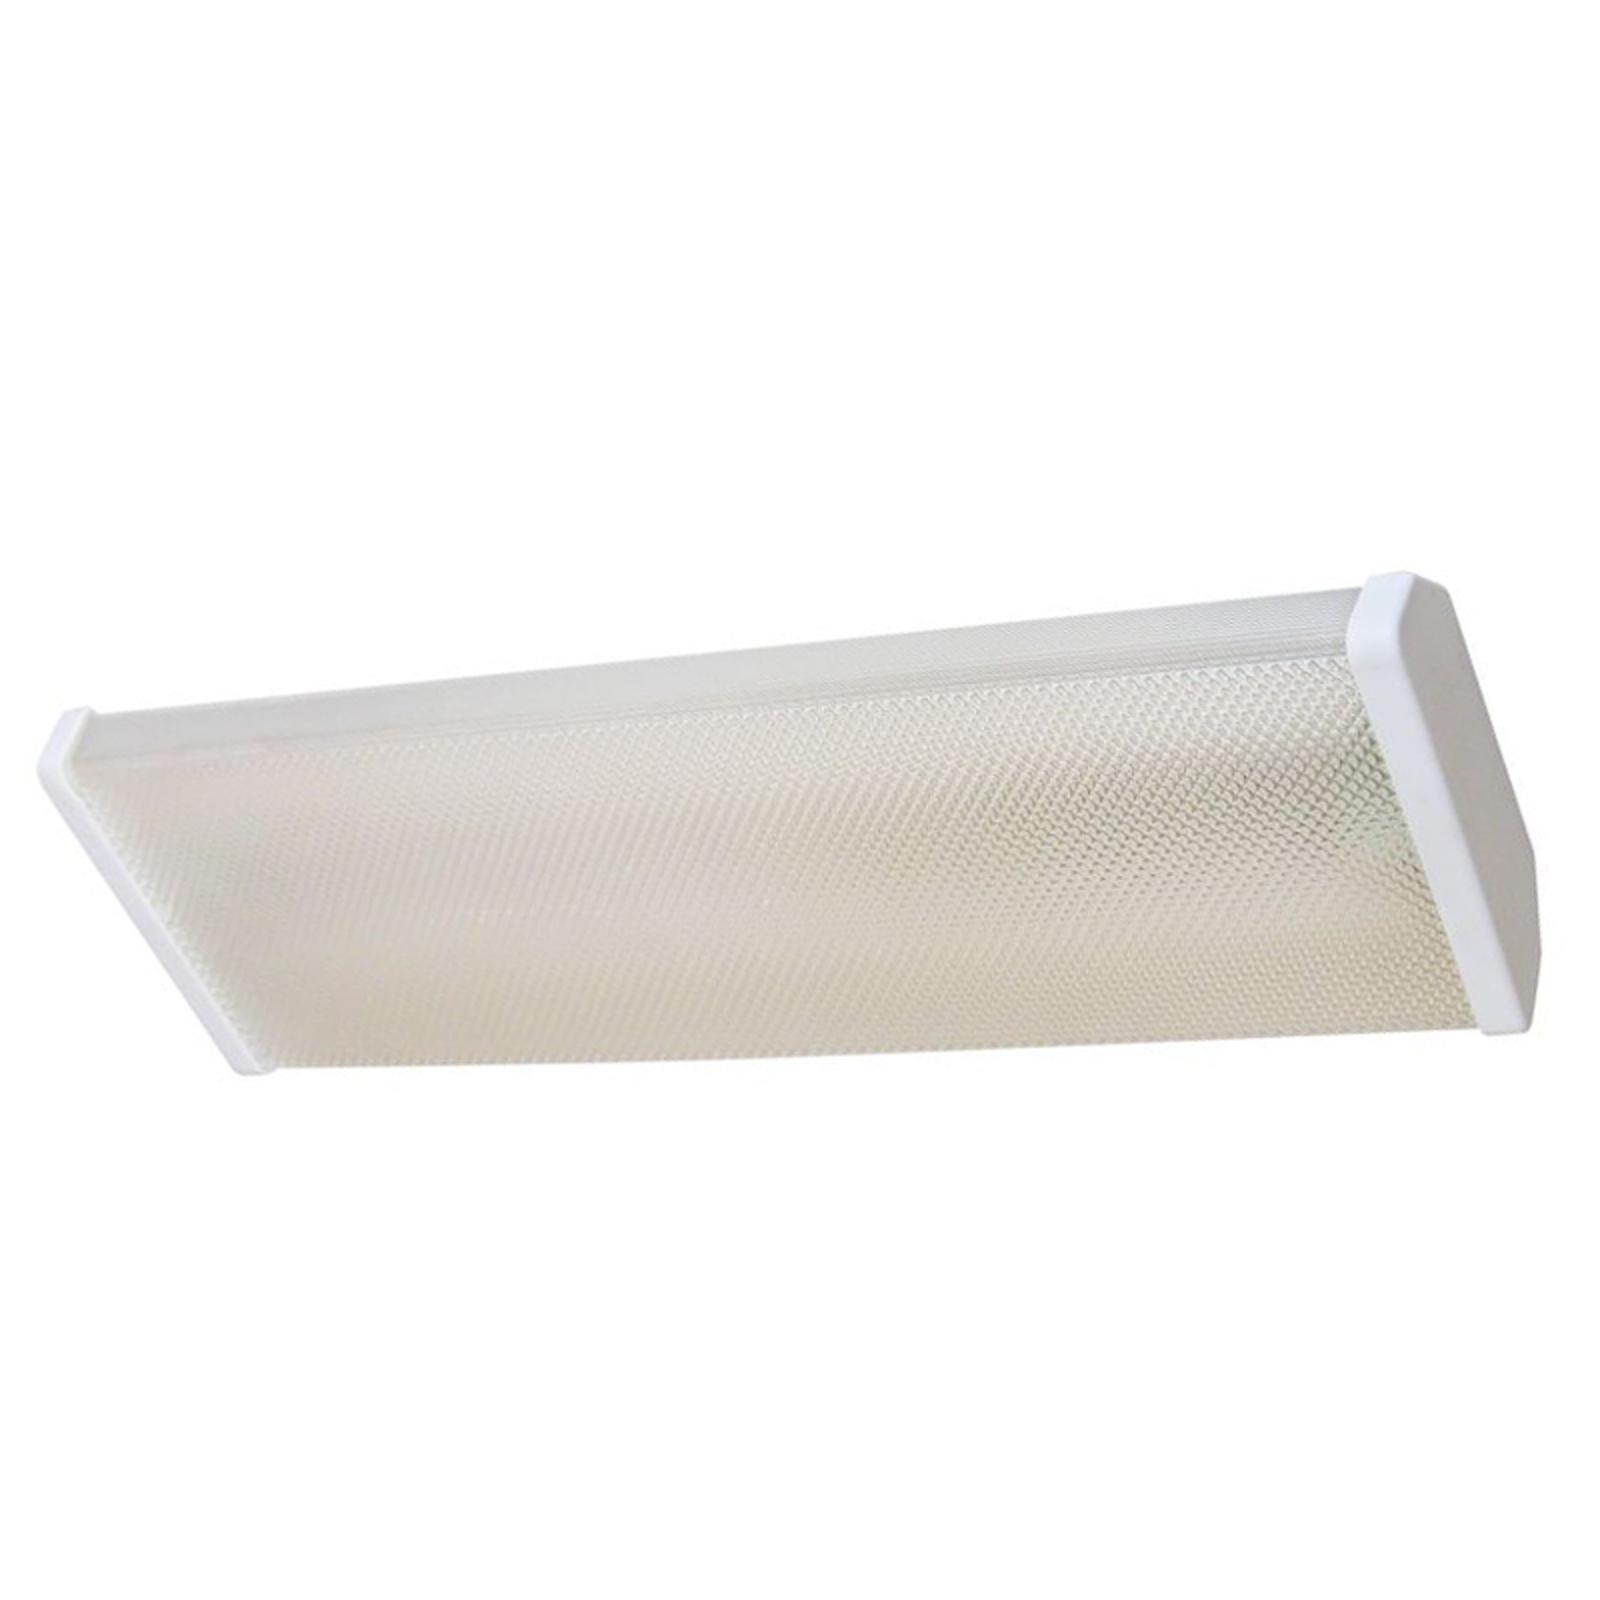 Lampa sufitowa Prismatik LED 18 W